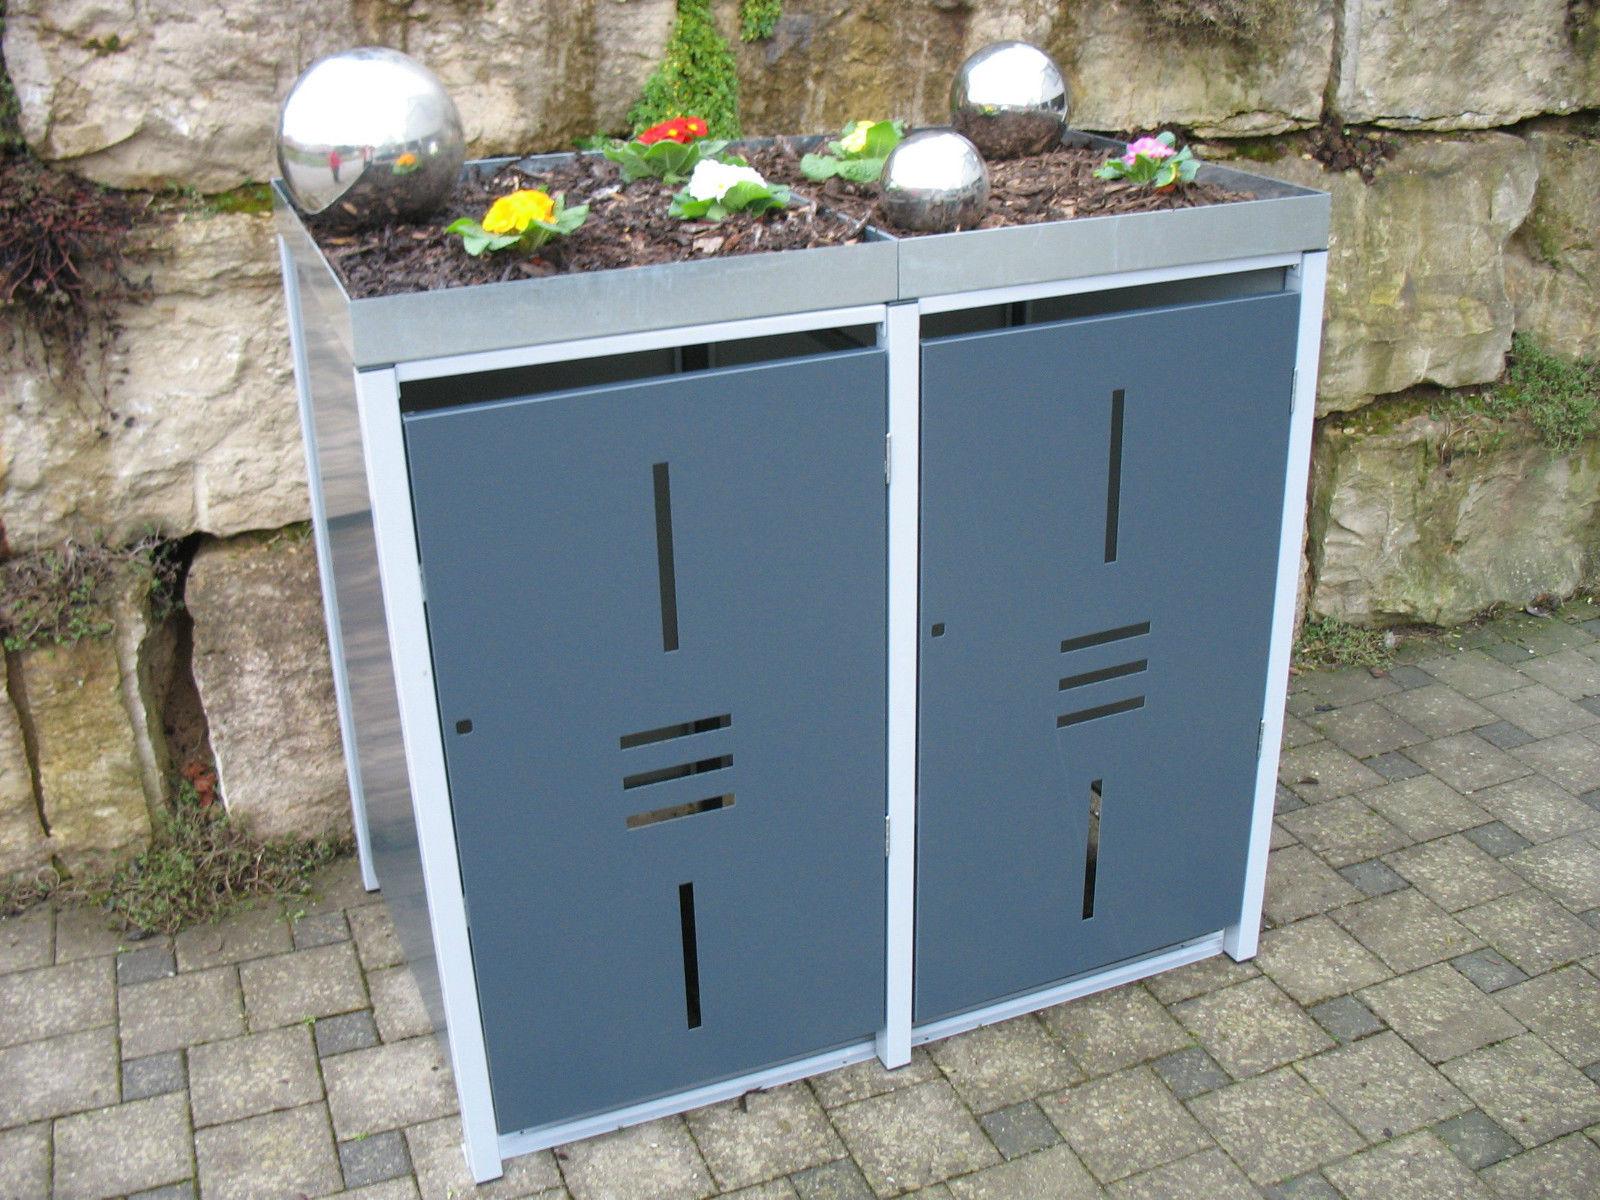 metall m lltonnenbox f r 2 tonnen m llcontainer m llbox made in germany balkon garten shop. Black Bedroom Furniture Sets. Home Design Ideas